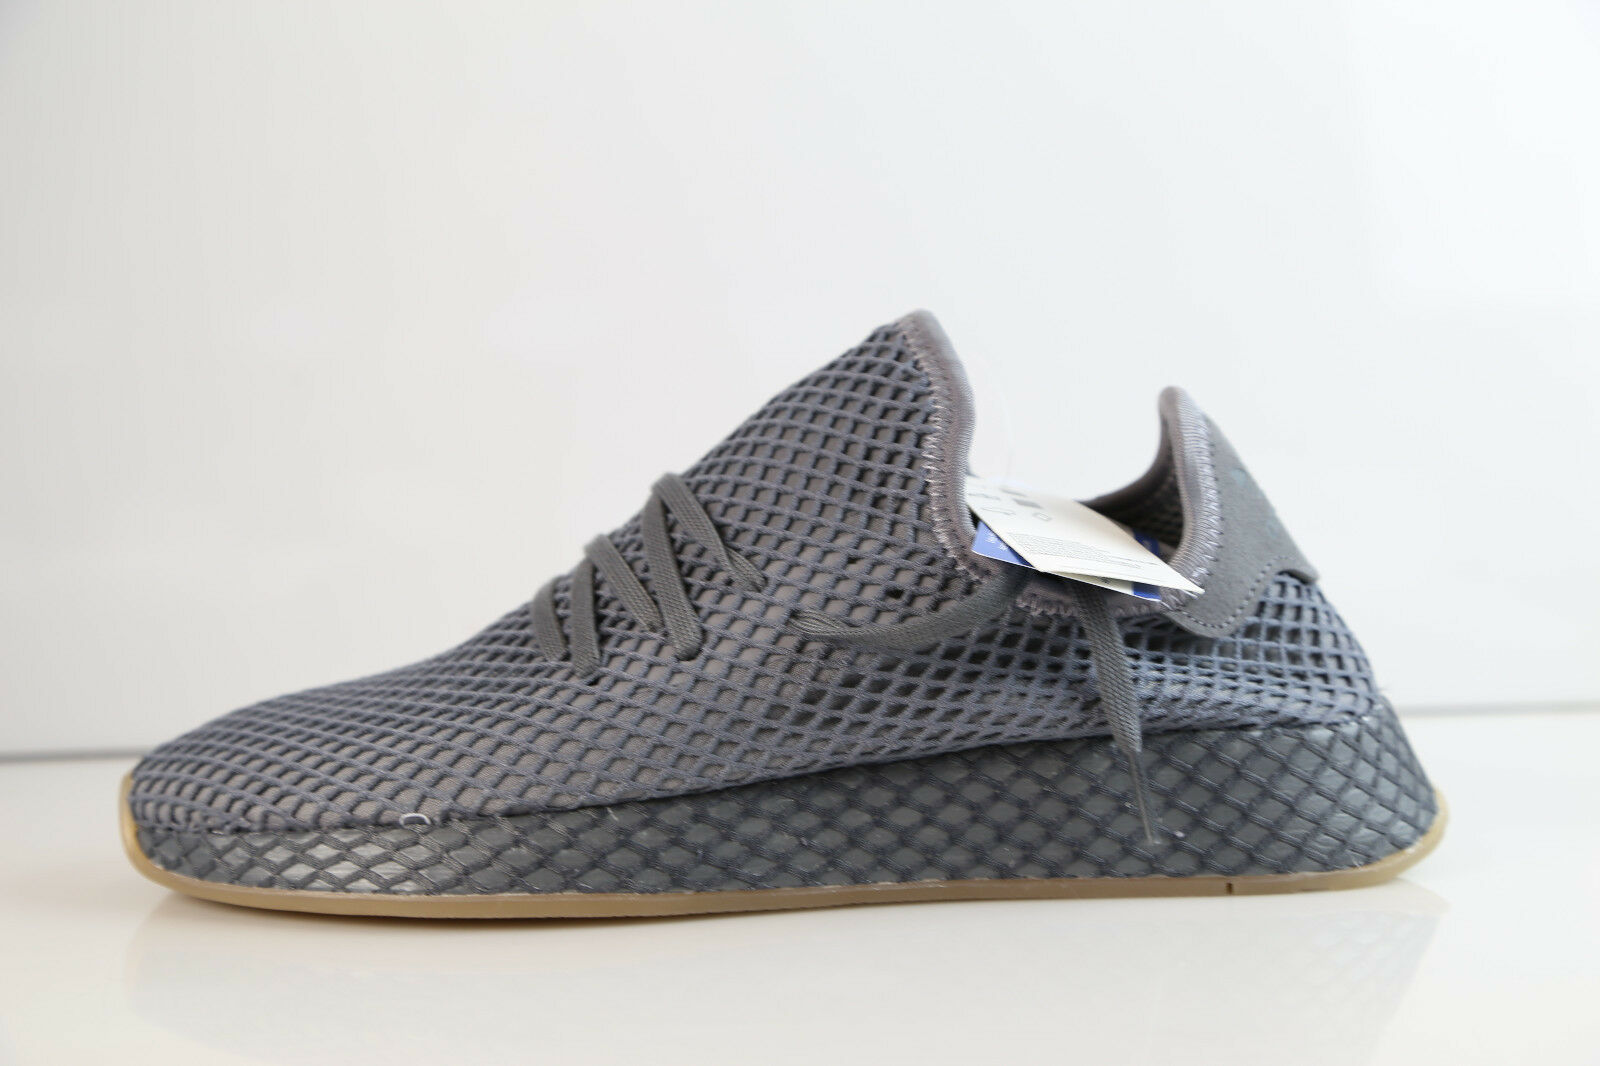 Adidas Deerupt Runner grigio Gum CQ2627 CQ2627 CQ2627 8-11 run ed0632